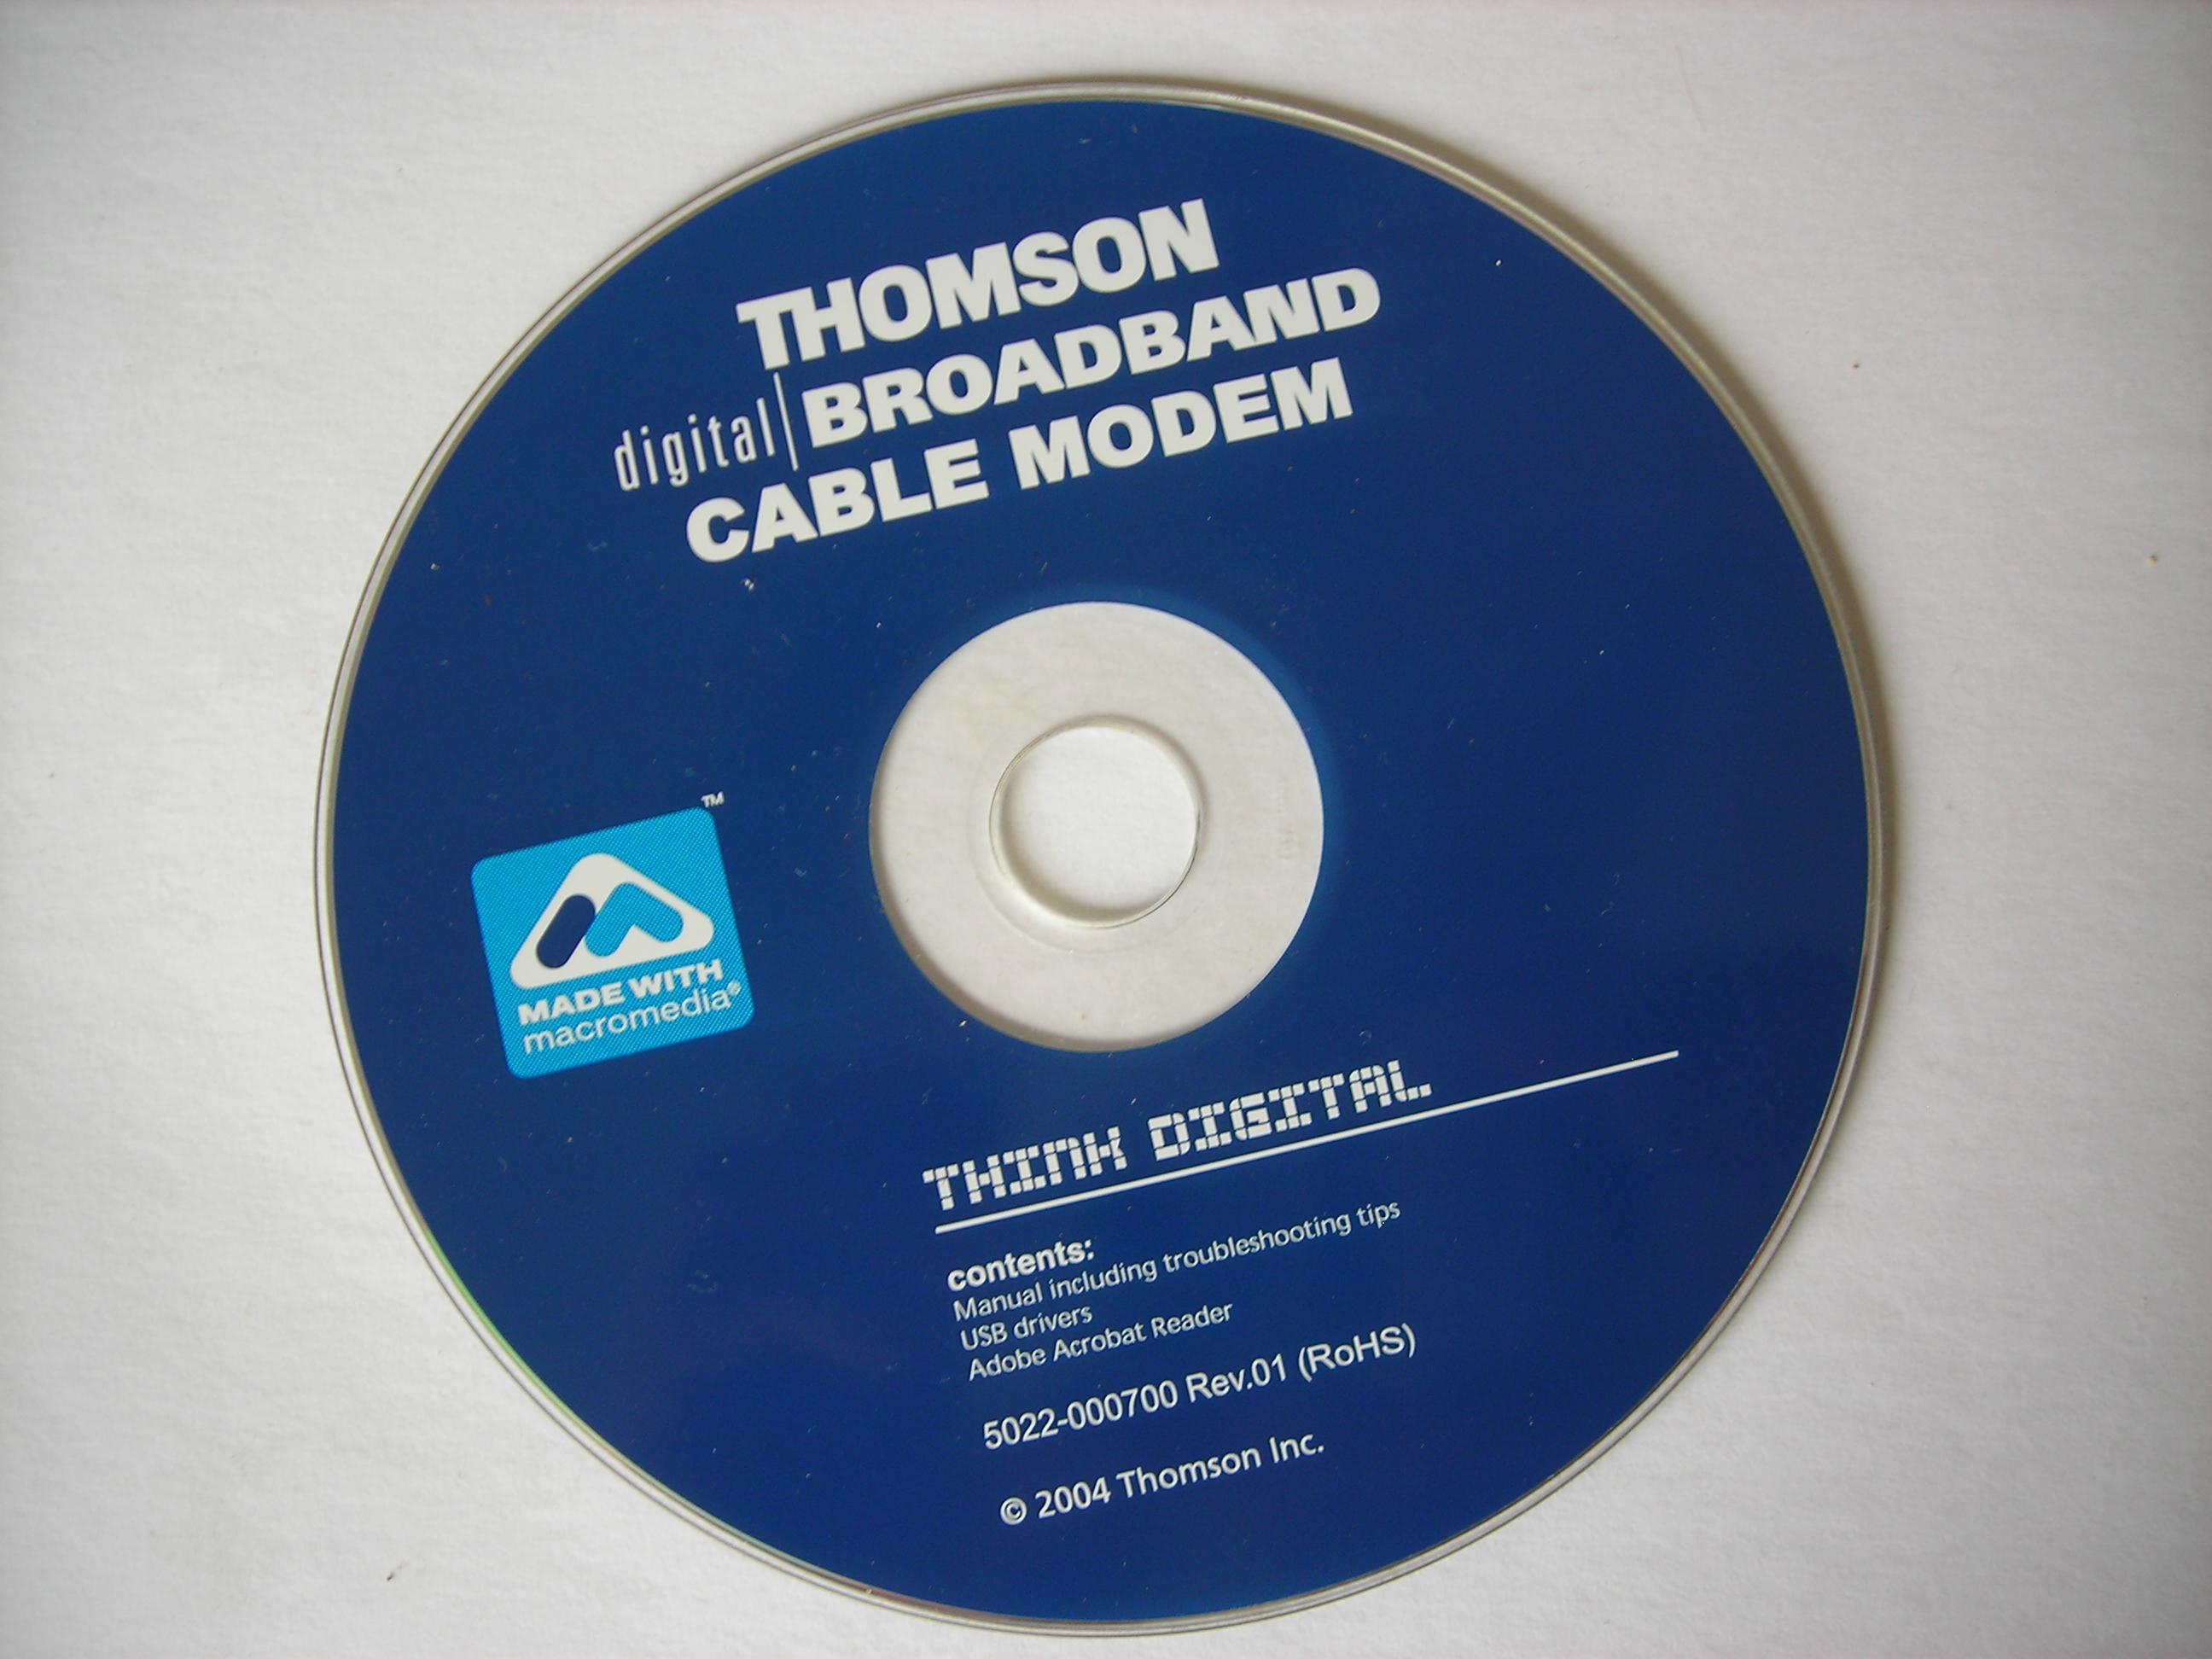 Thomson Digital | BROADBAND CABLE MODEM : Thomson Inc